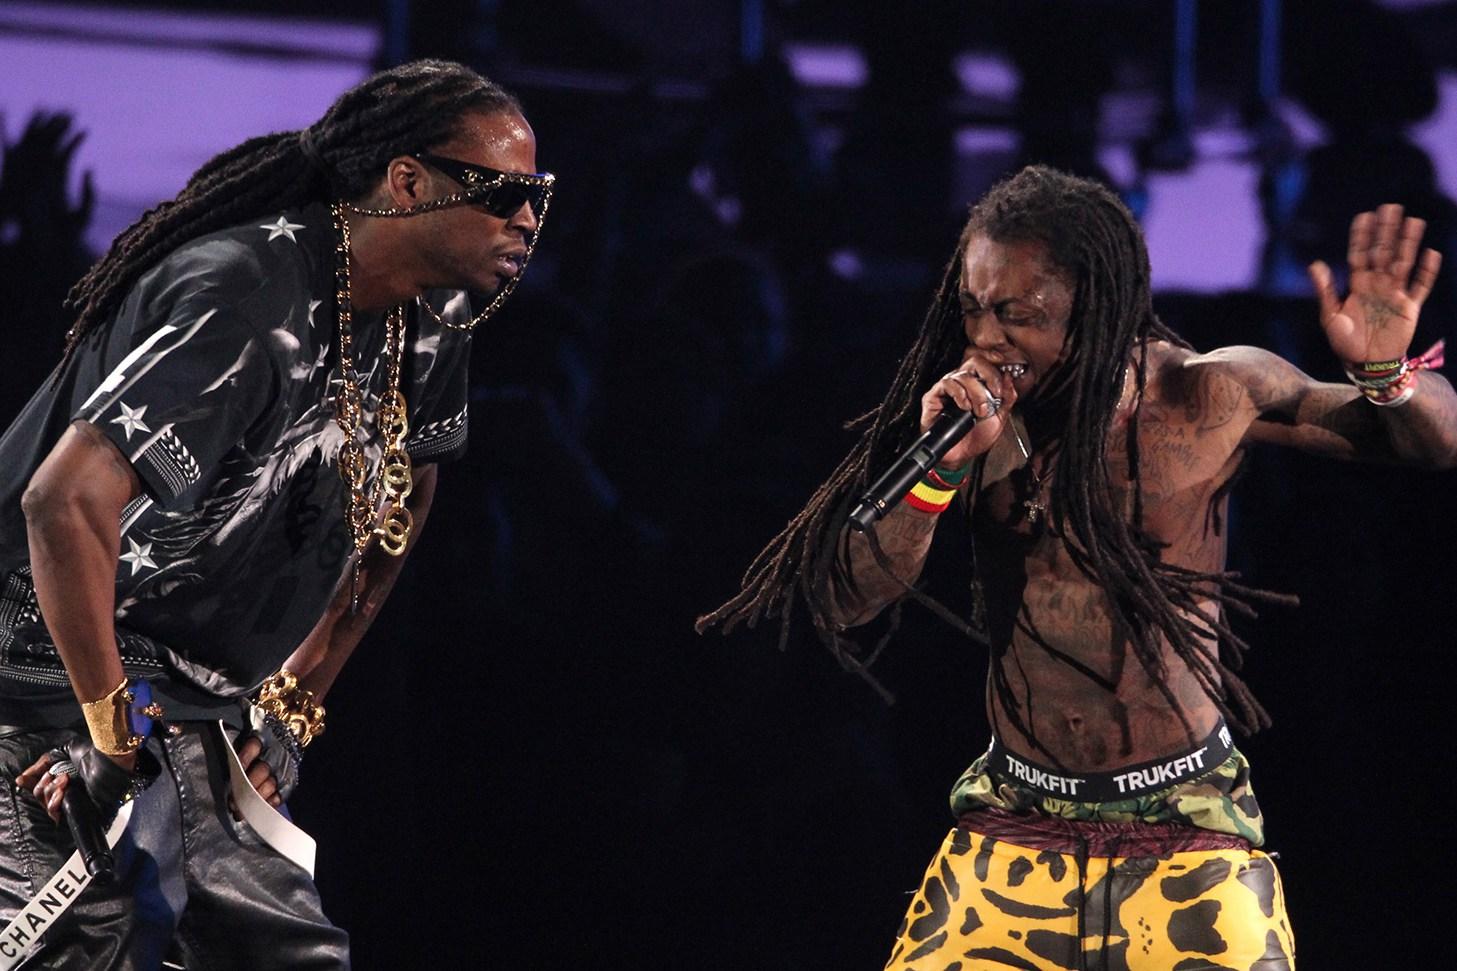 Download Yuck 2 Chainz Lil Wayne